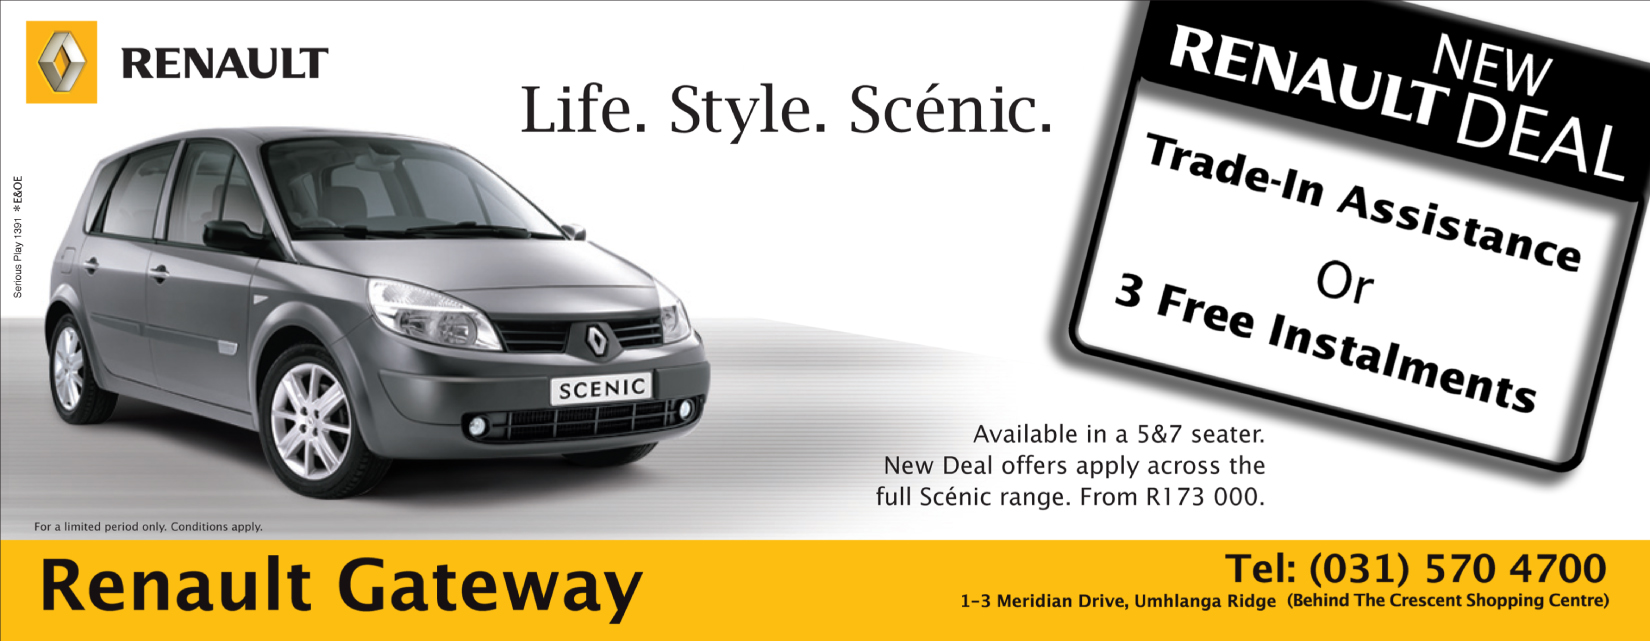 Portfolio image for Renault (campaign 1)